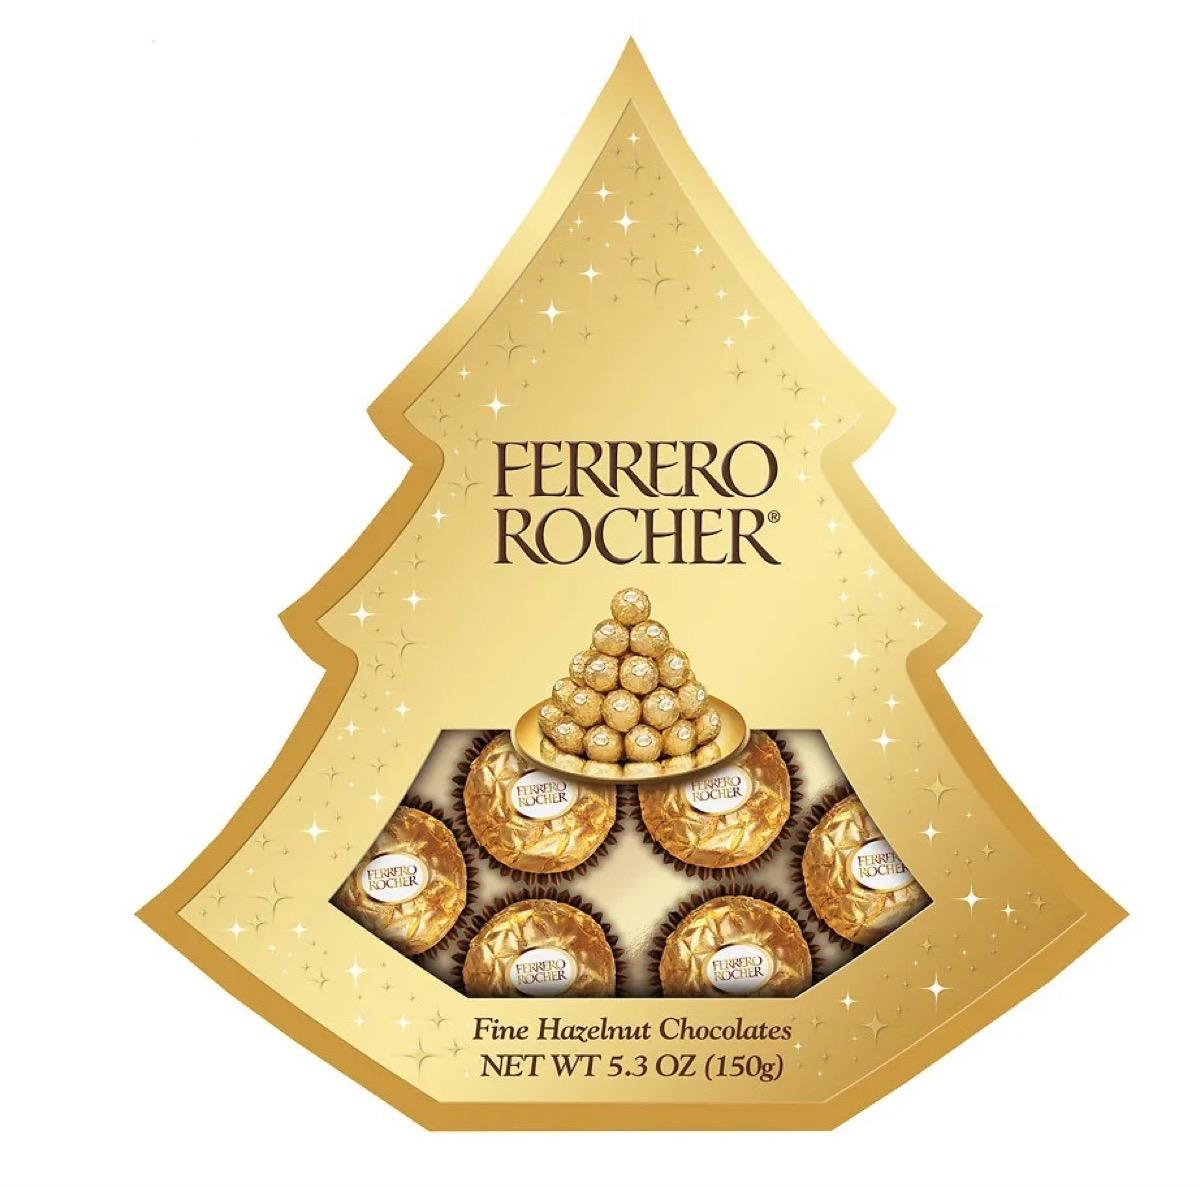 gold tree-shaped box of ferrero rocher chocolates